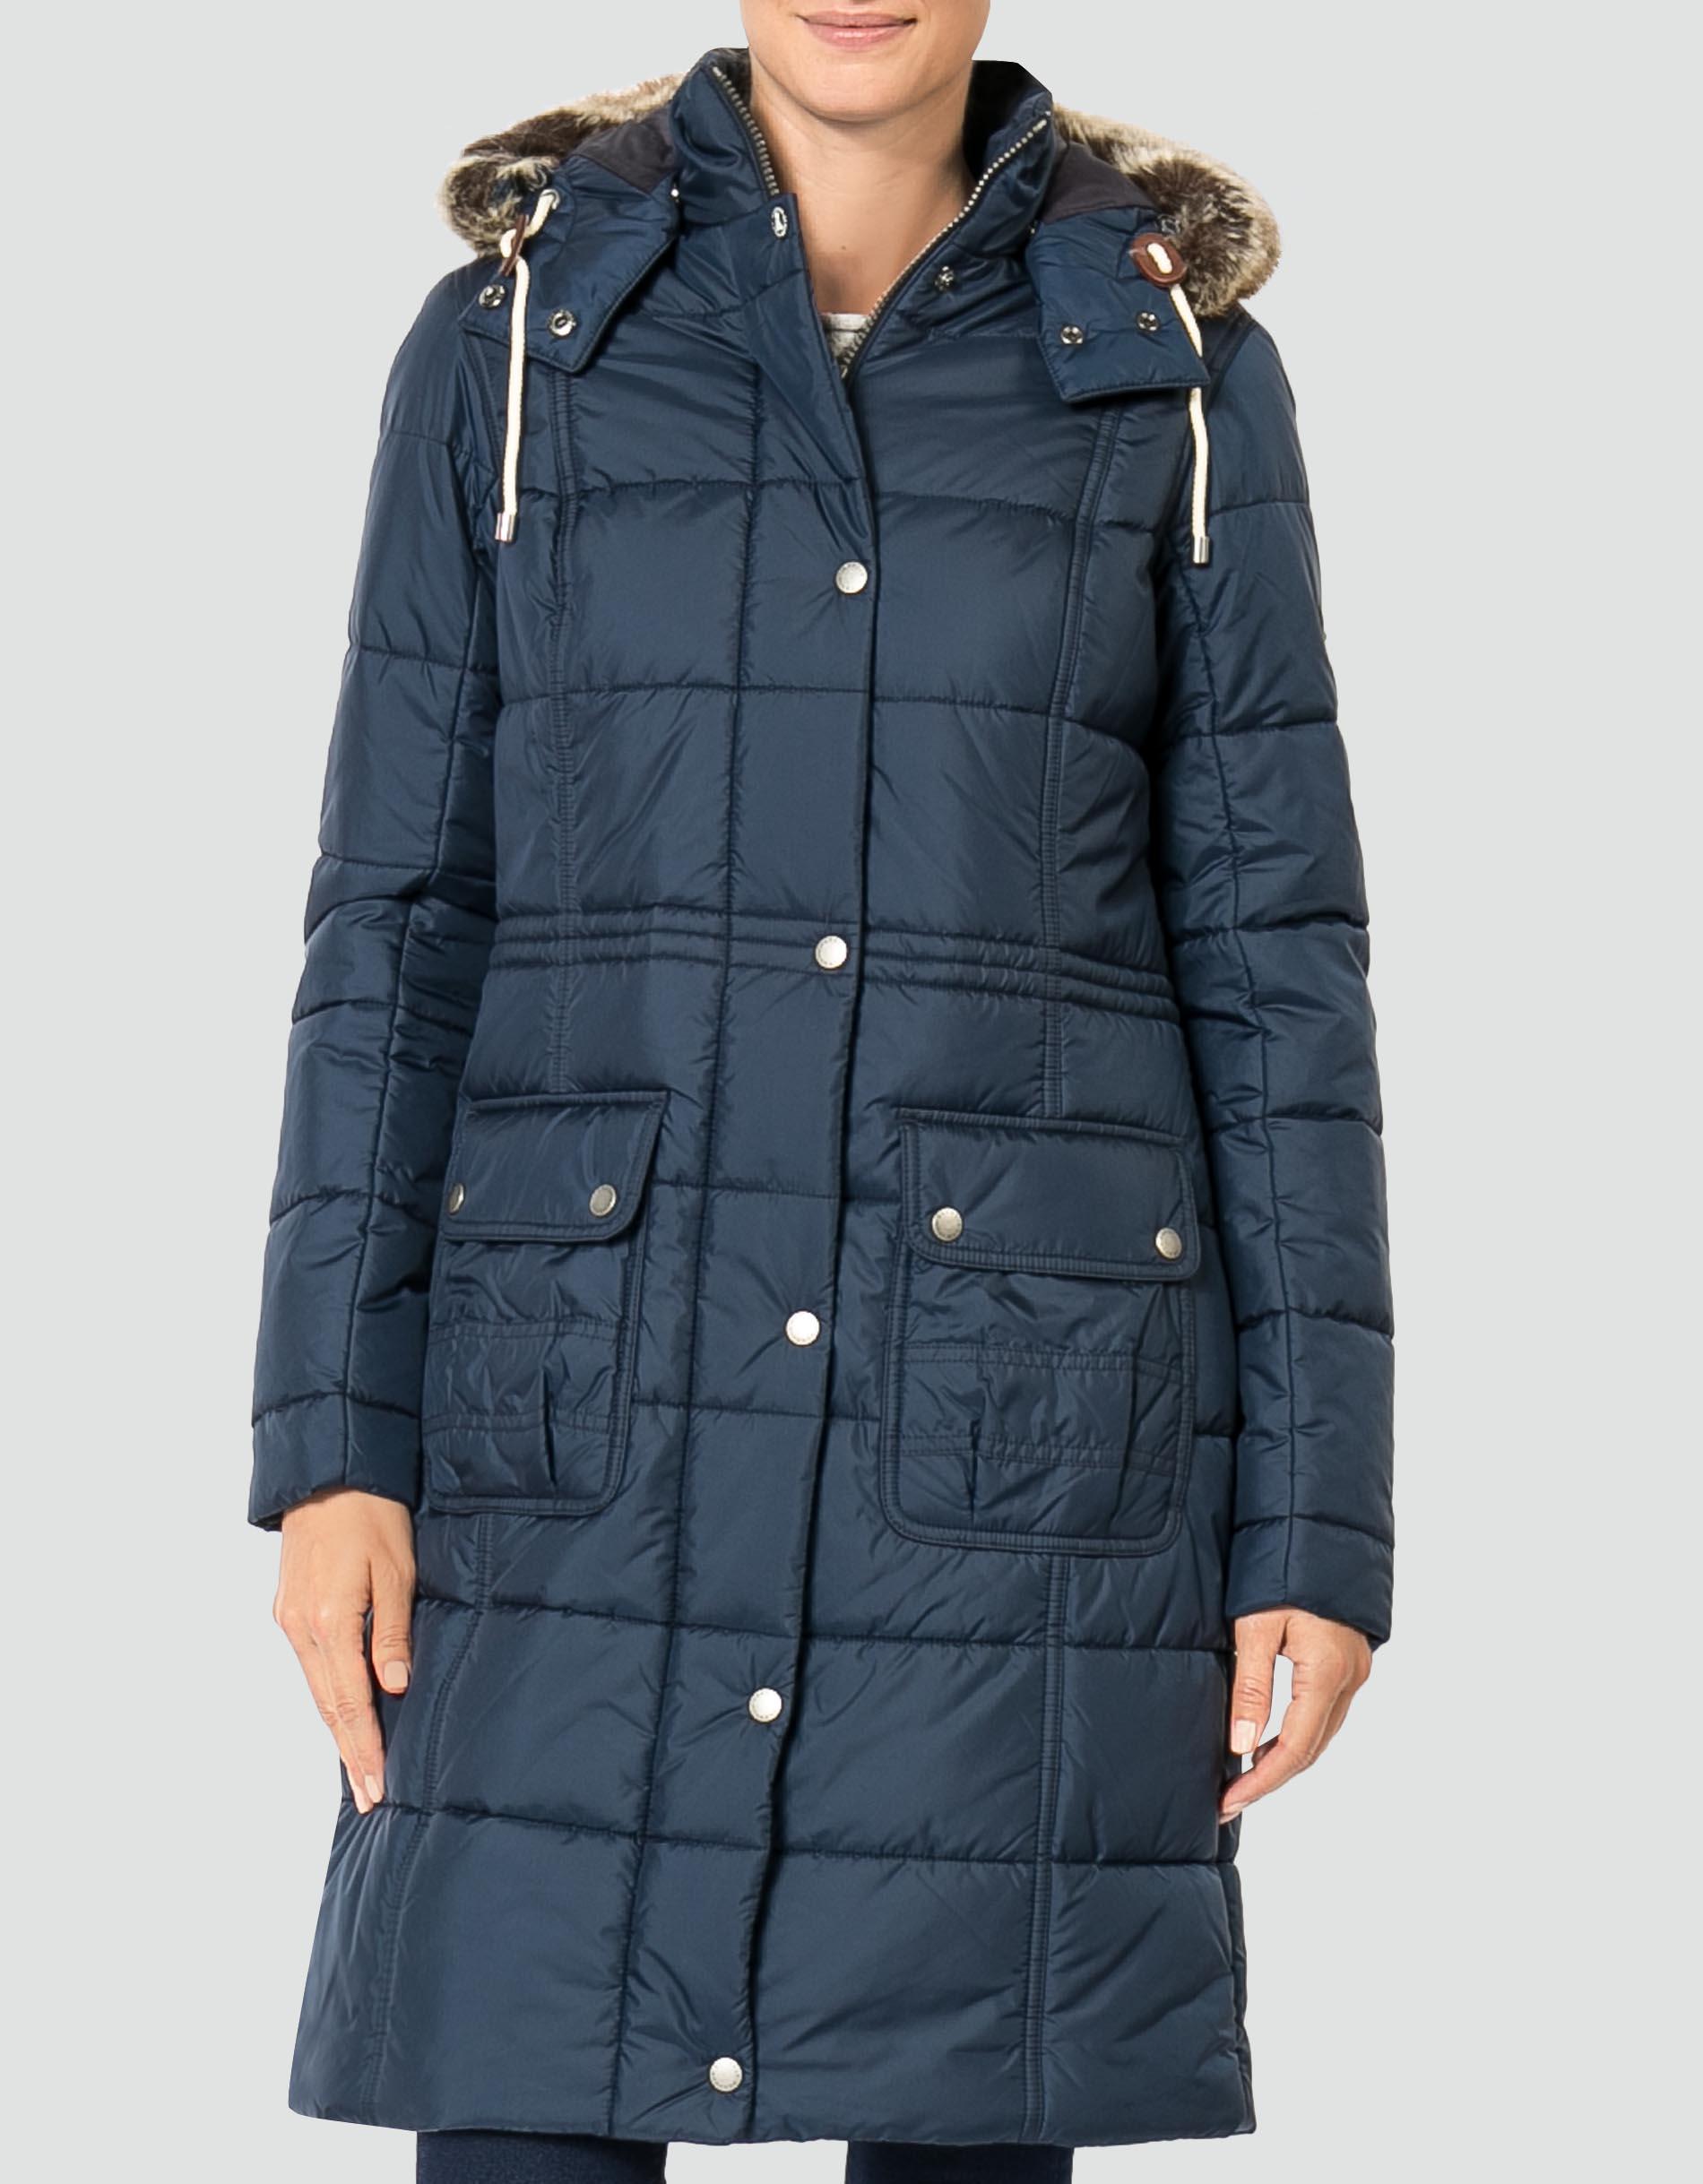 Barbour winter mantel